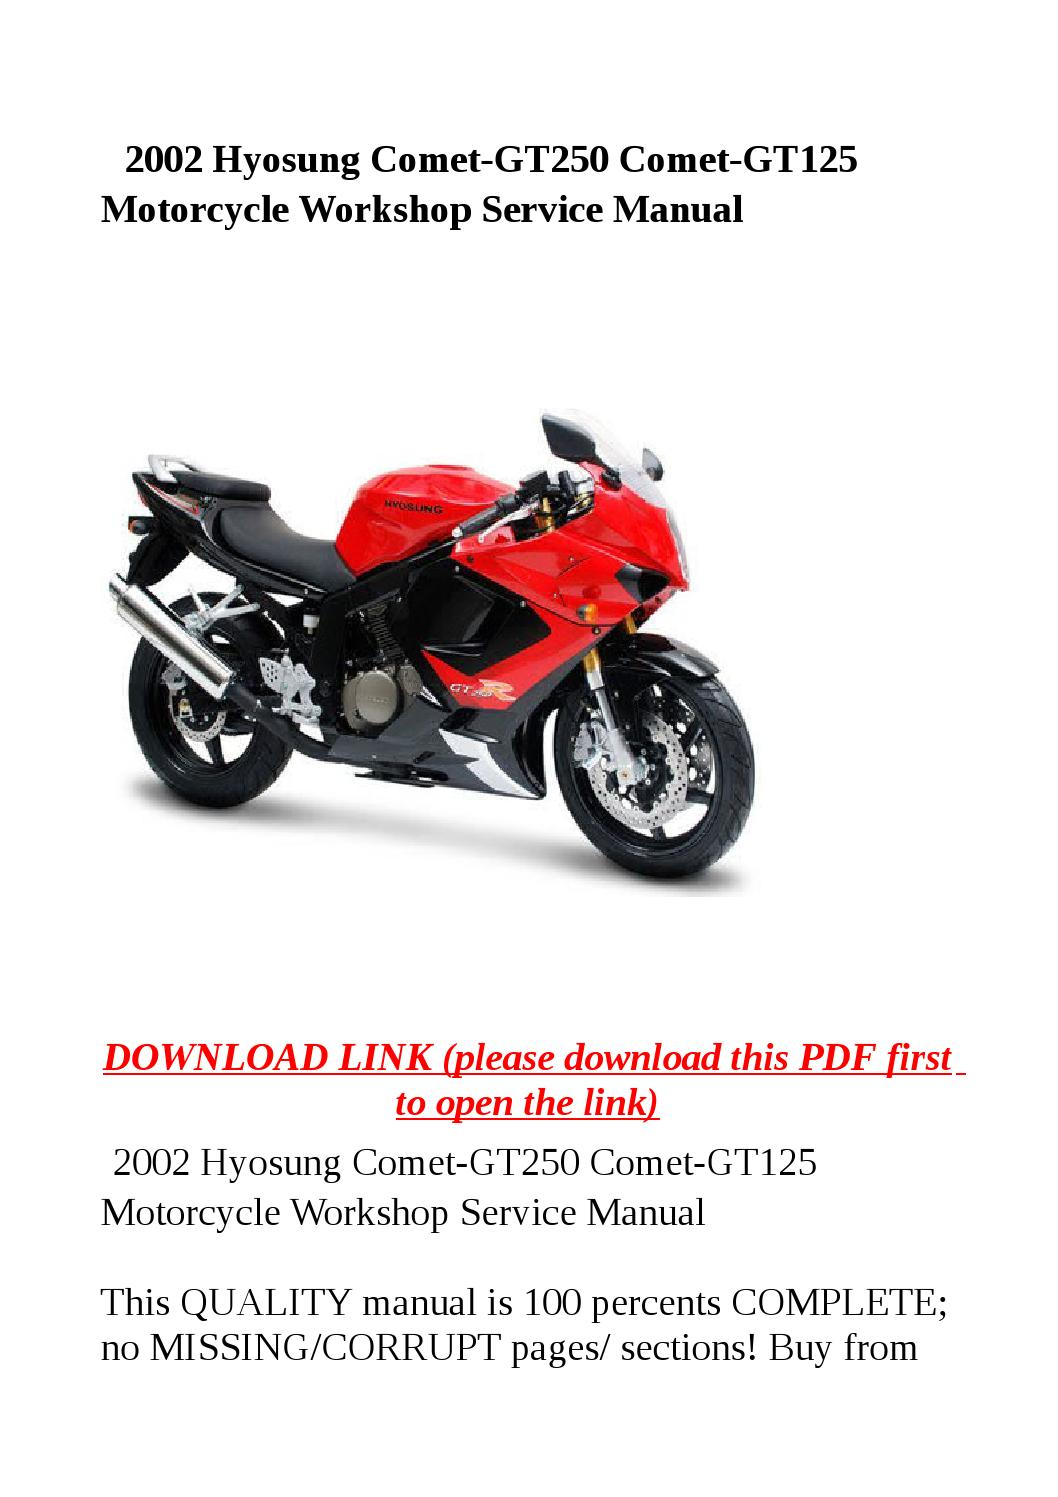 hyosung gt250 manual